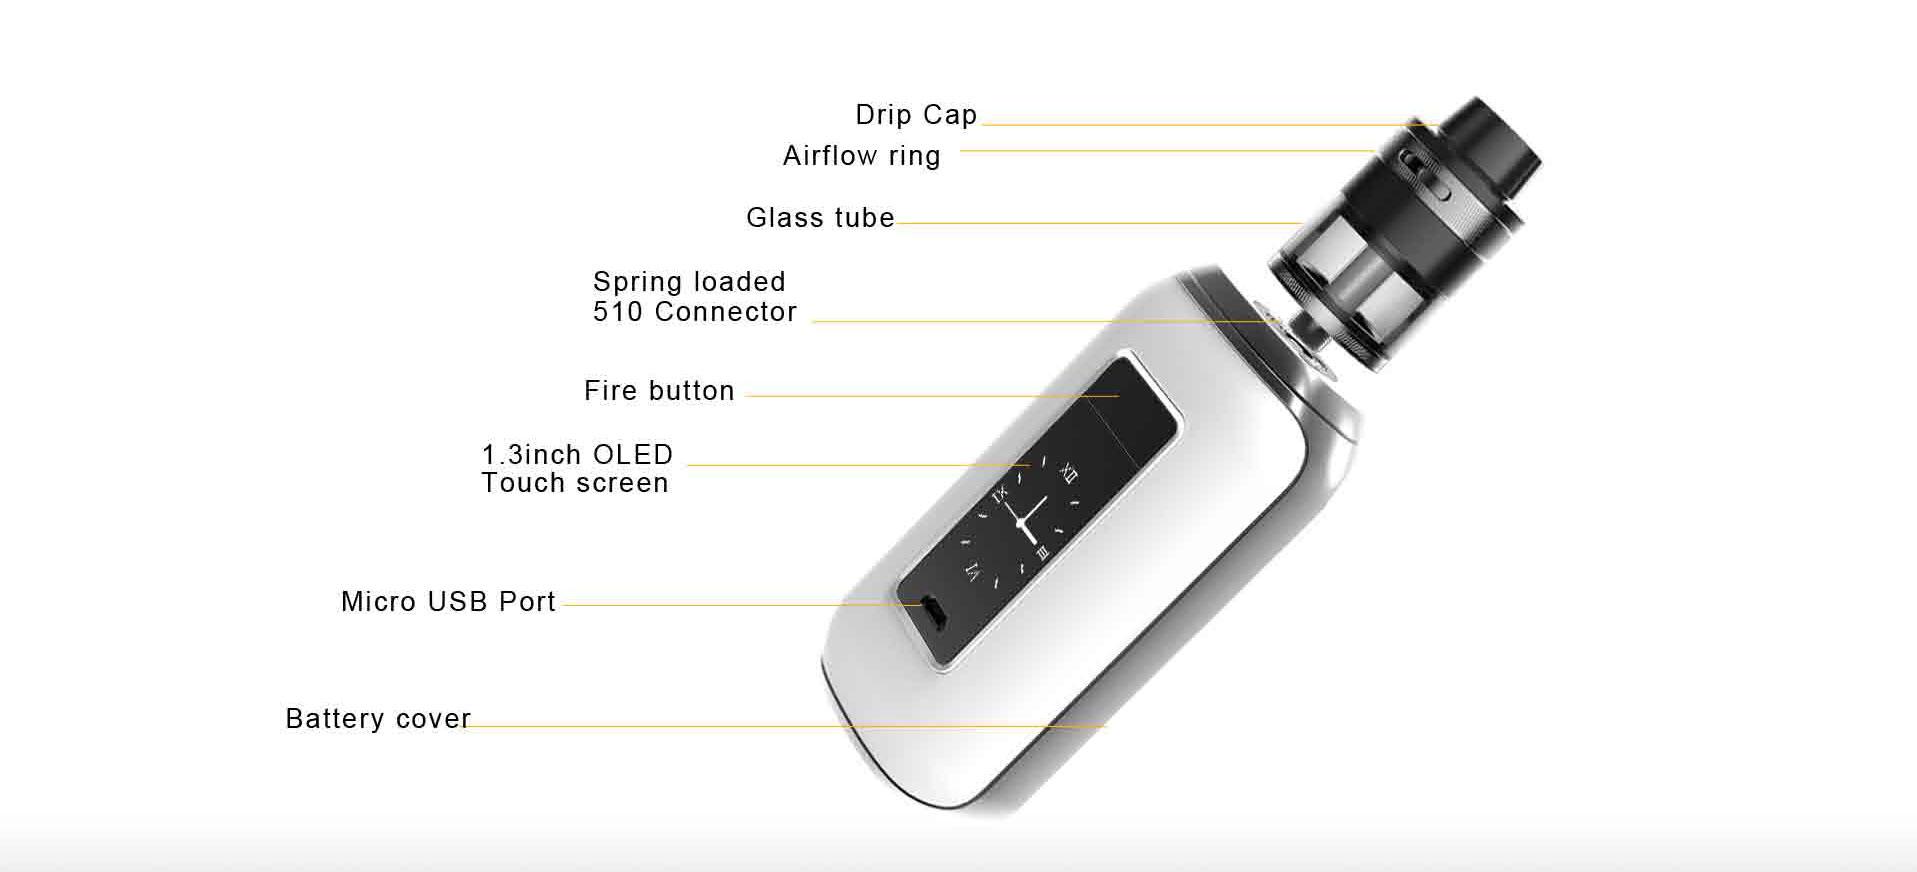 Aspire SkyStar Revvo Kit Component View